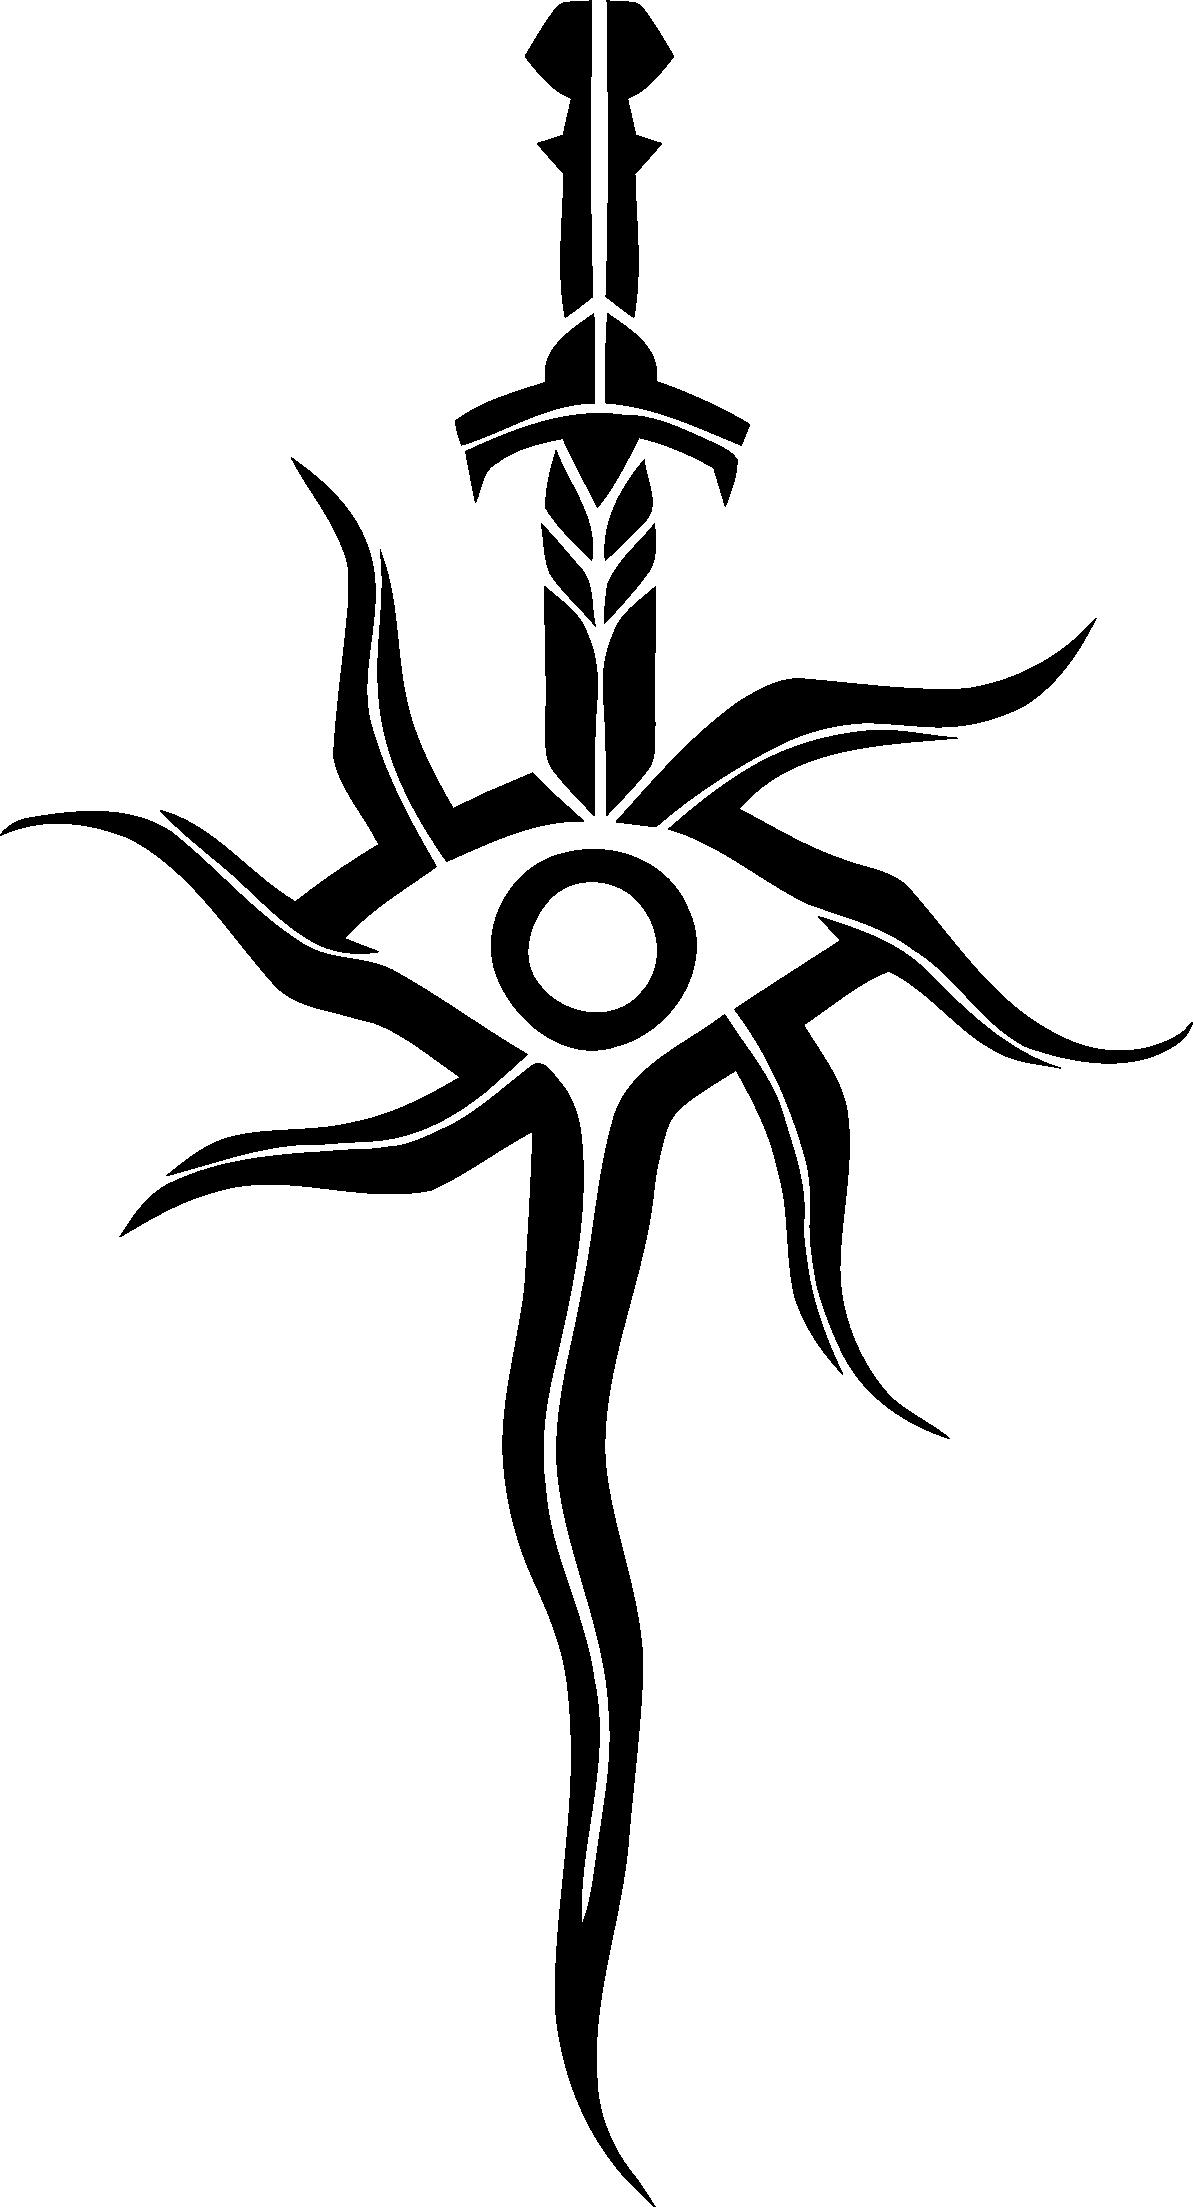 1193 X 2207 9.